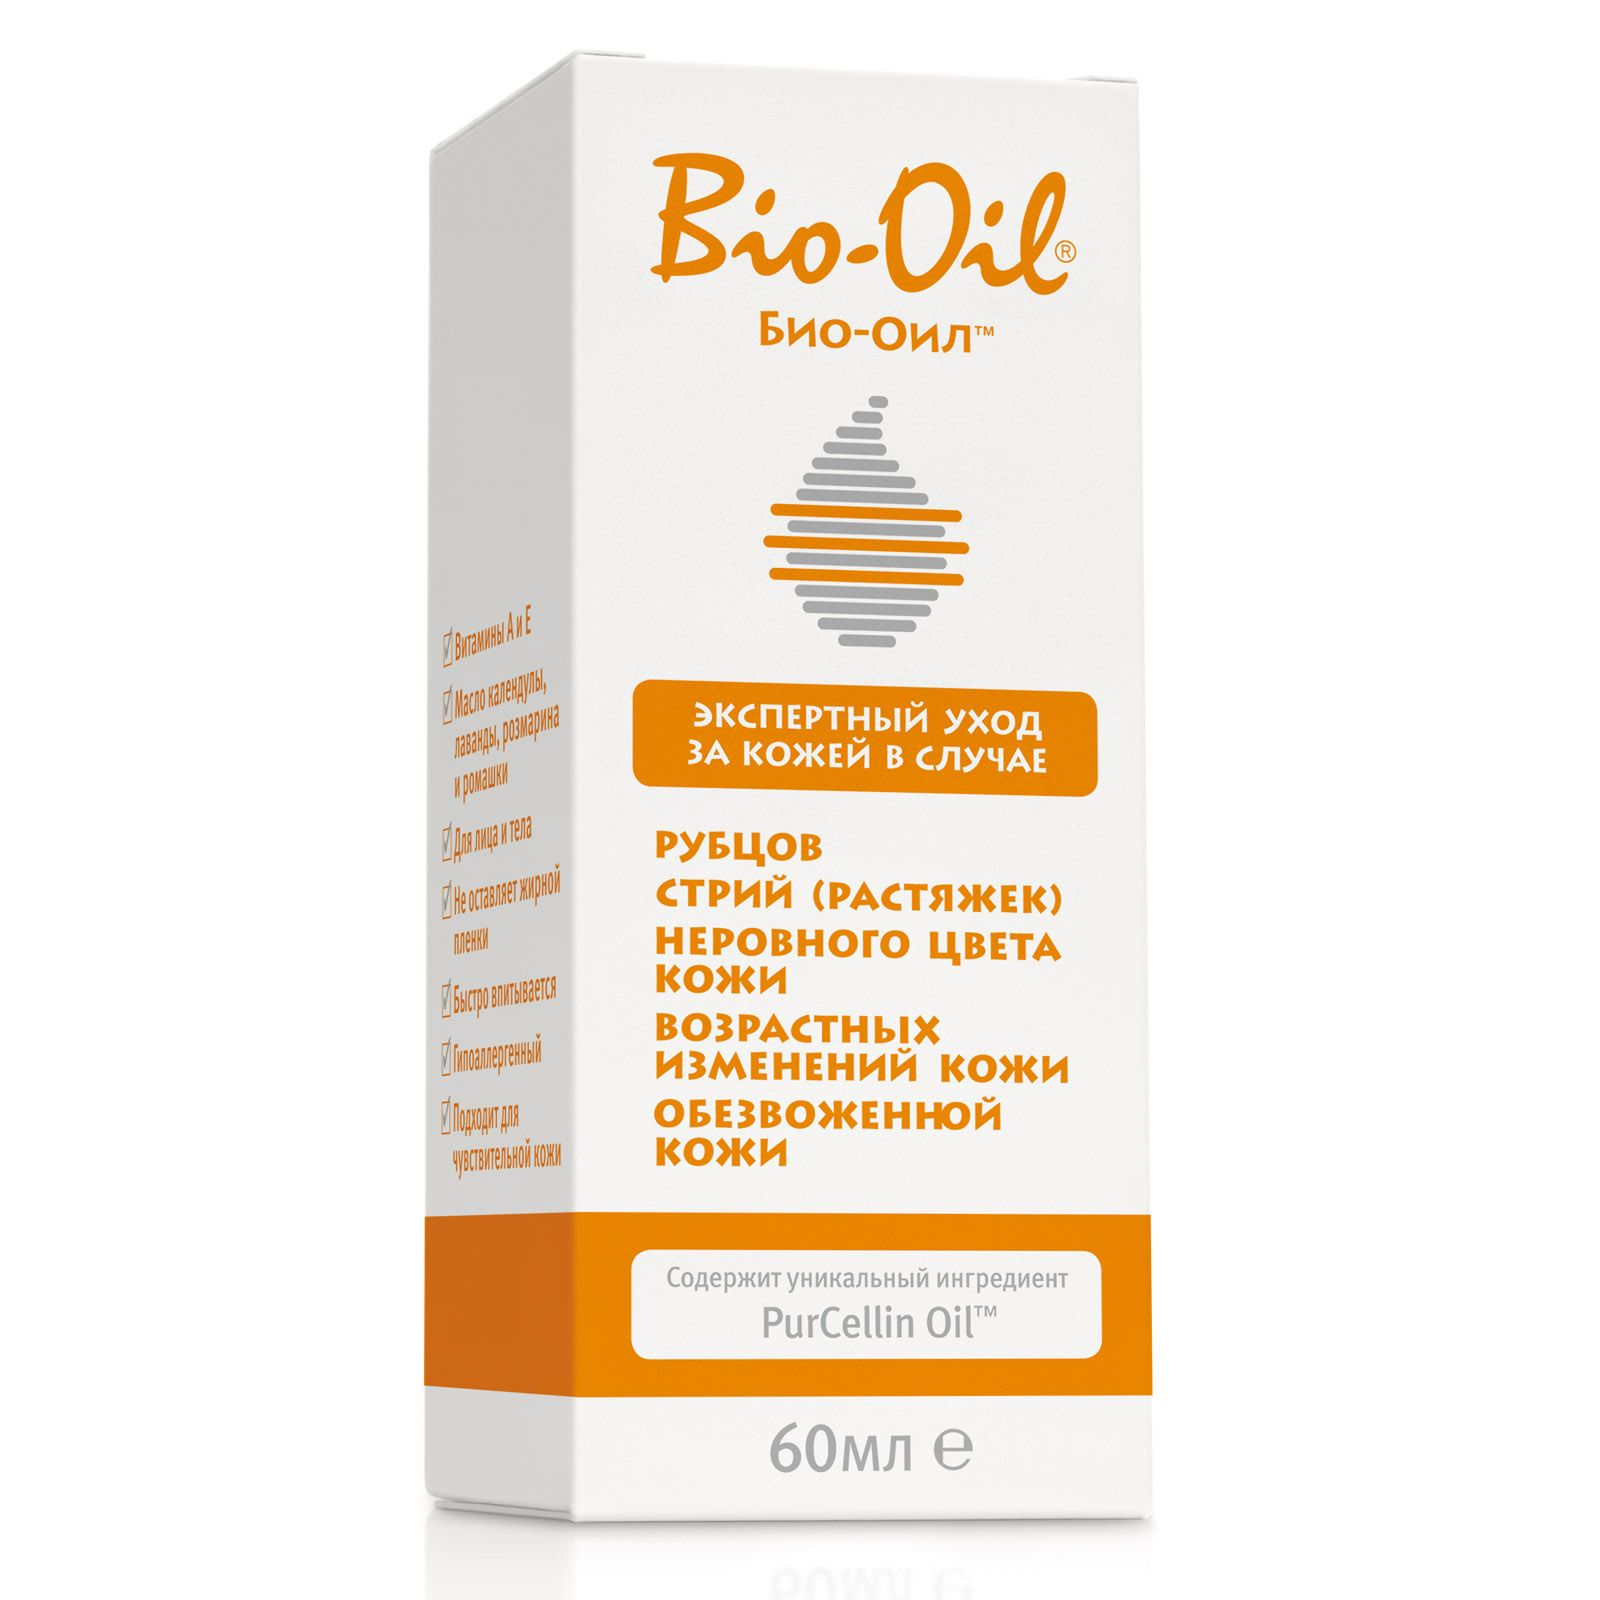 фото упаковки Bio-Oil